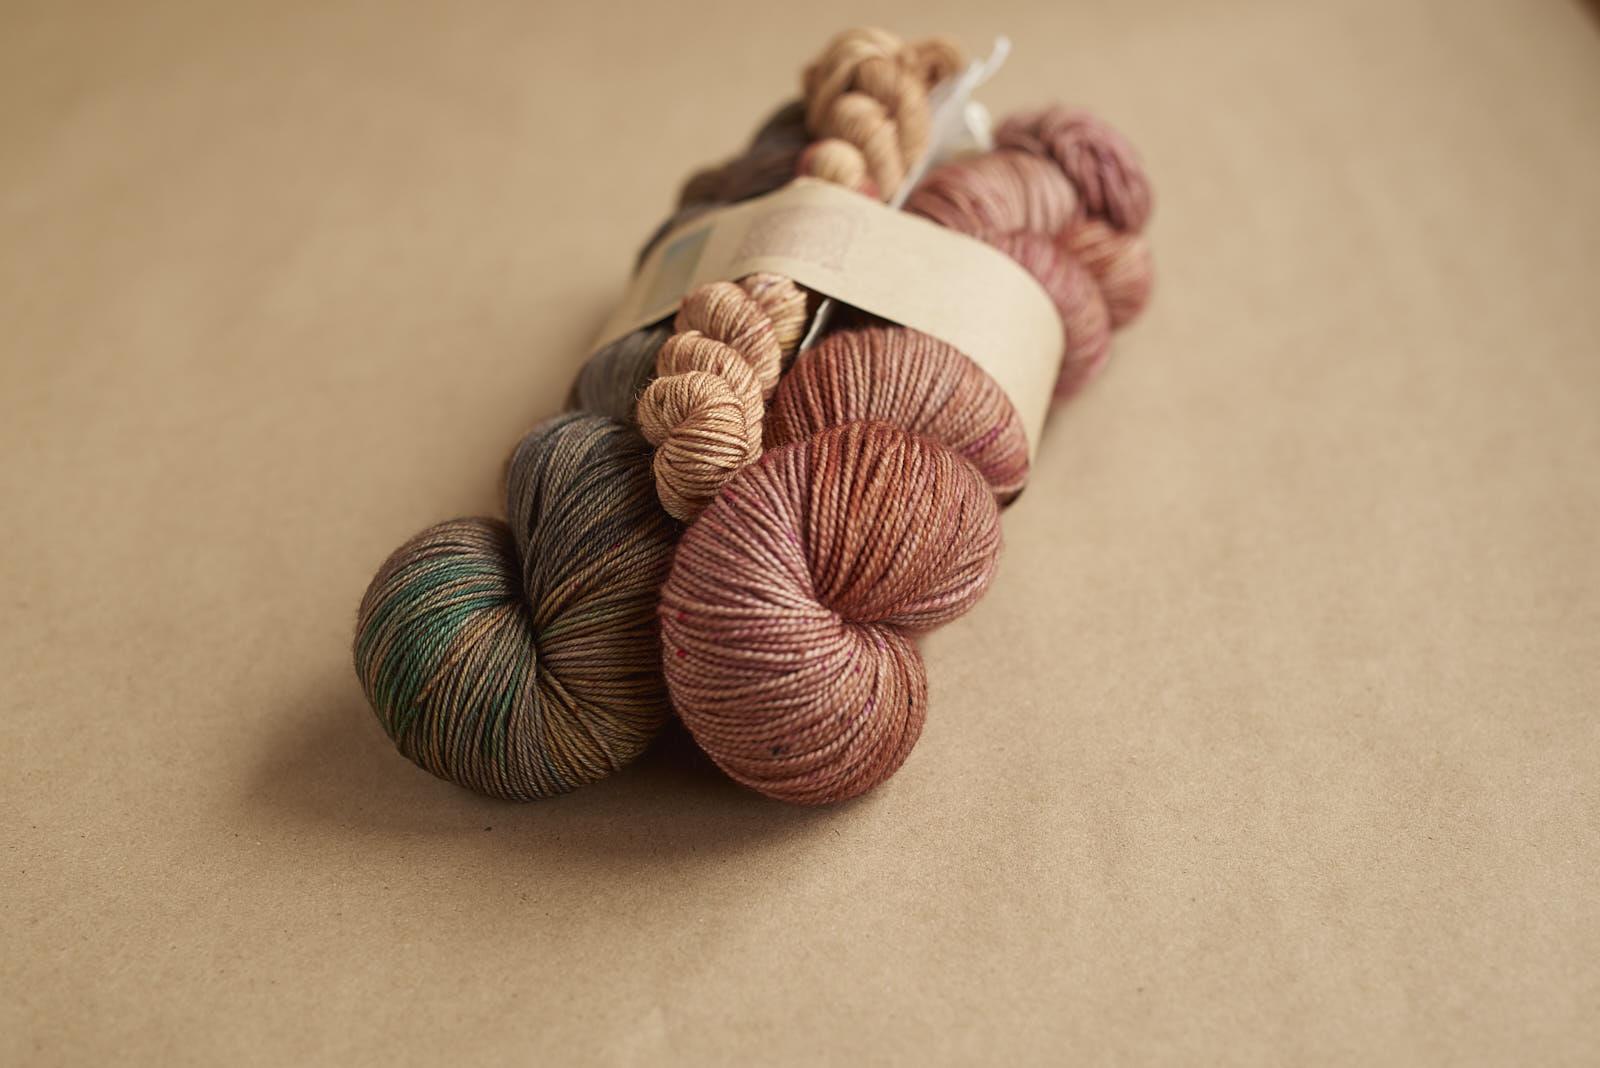 SNOWSHOE KIT #3: Sock Eclipse / Merino Fingering Down to the Wire / Sock Mini Rose Gold Dust